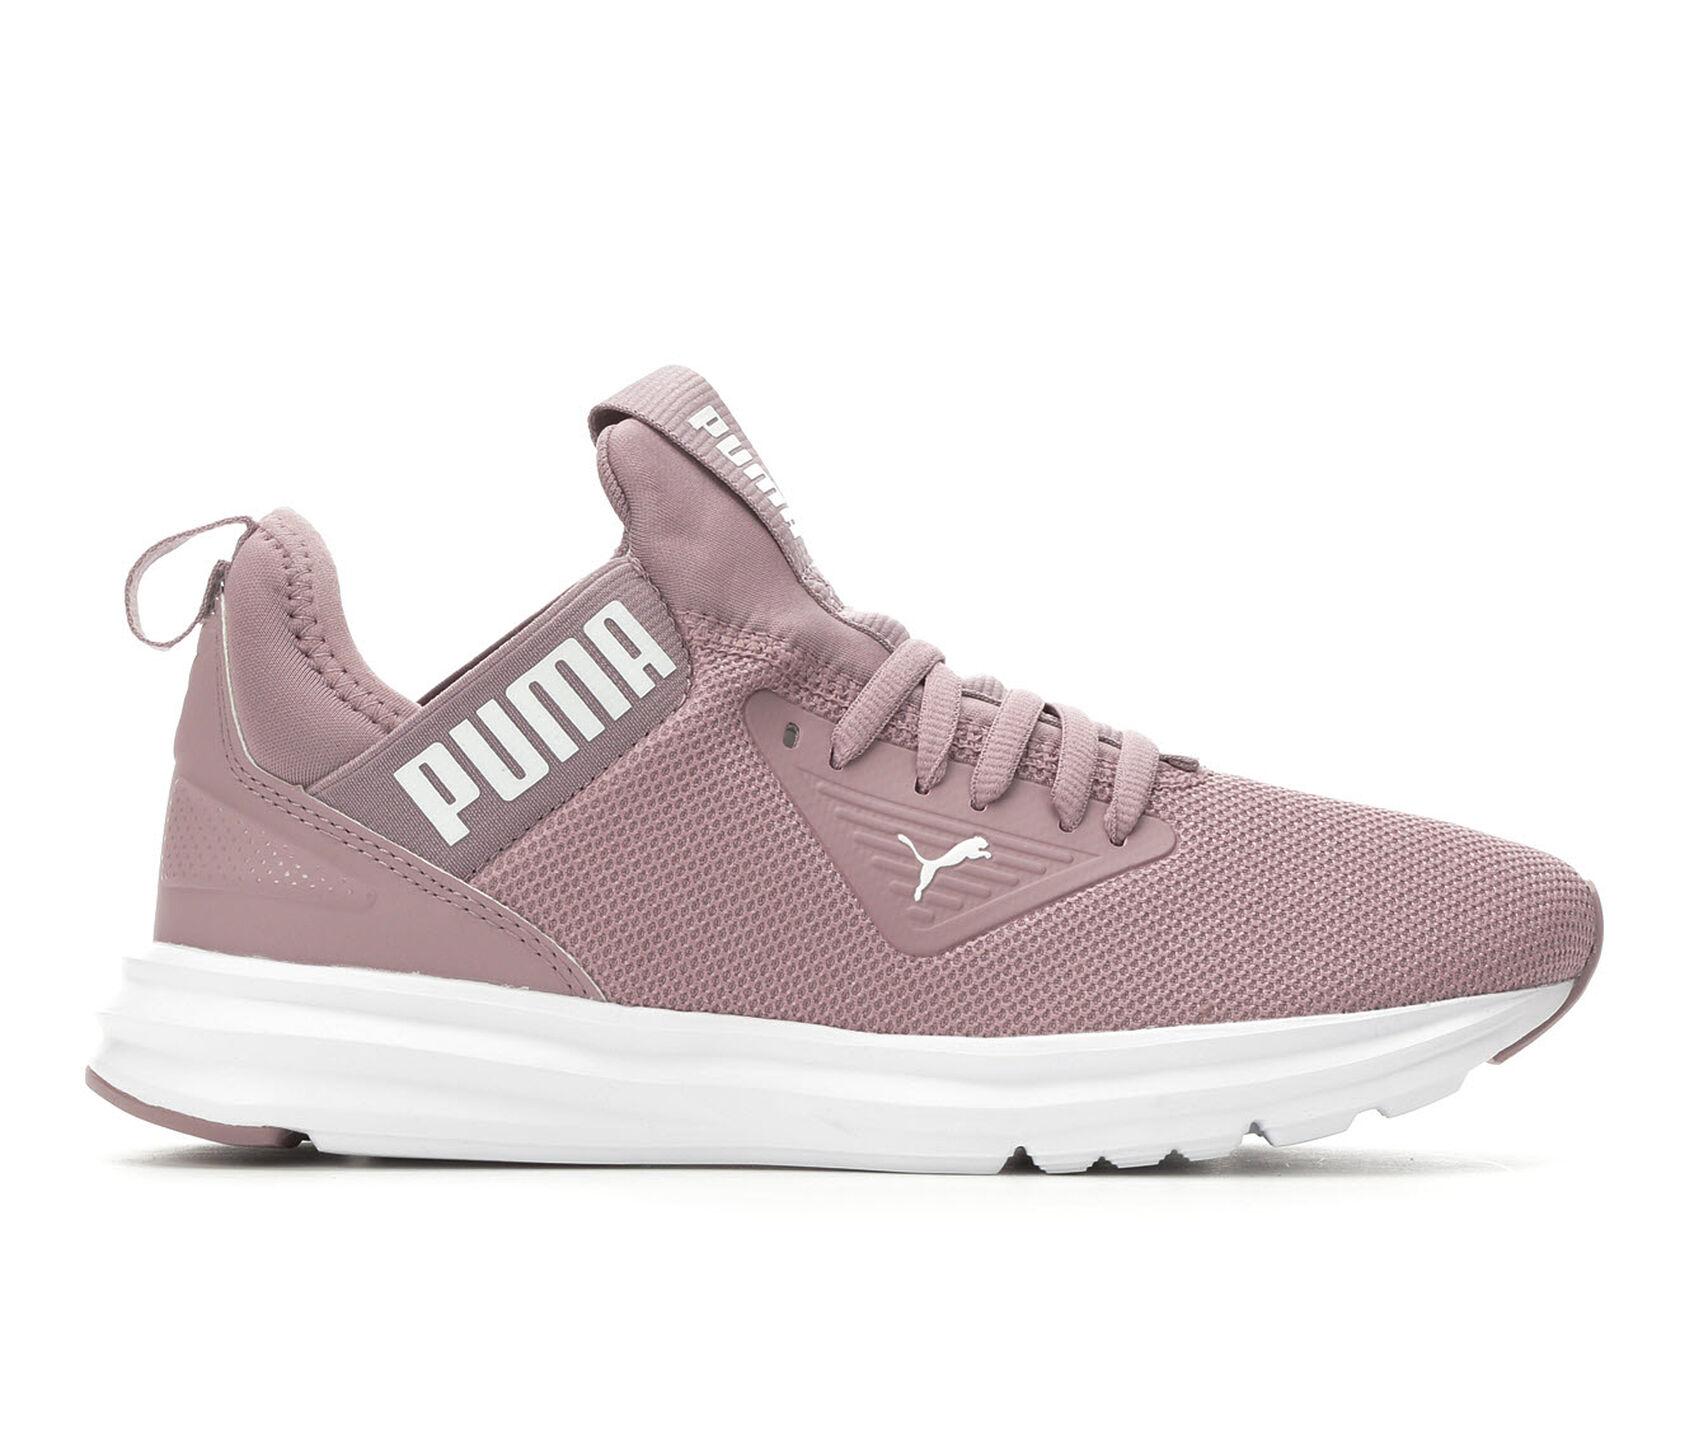 f9ed00ee4109 Women s Puma Enzo Beta Sneakers